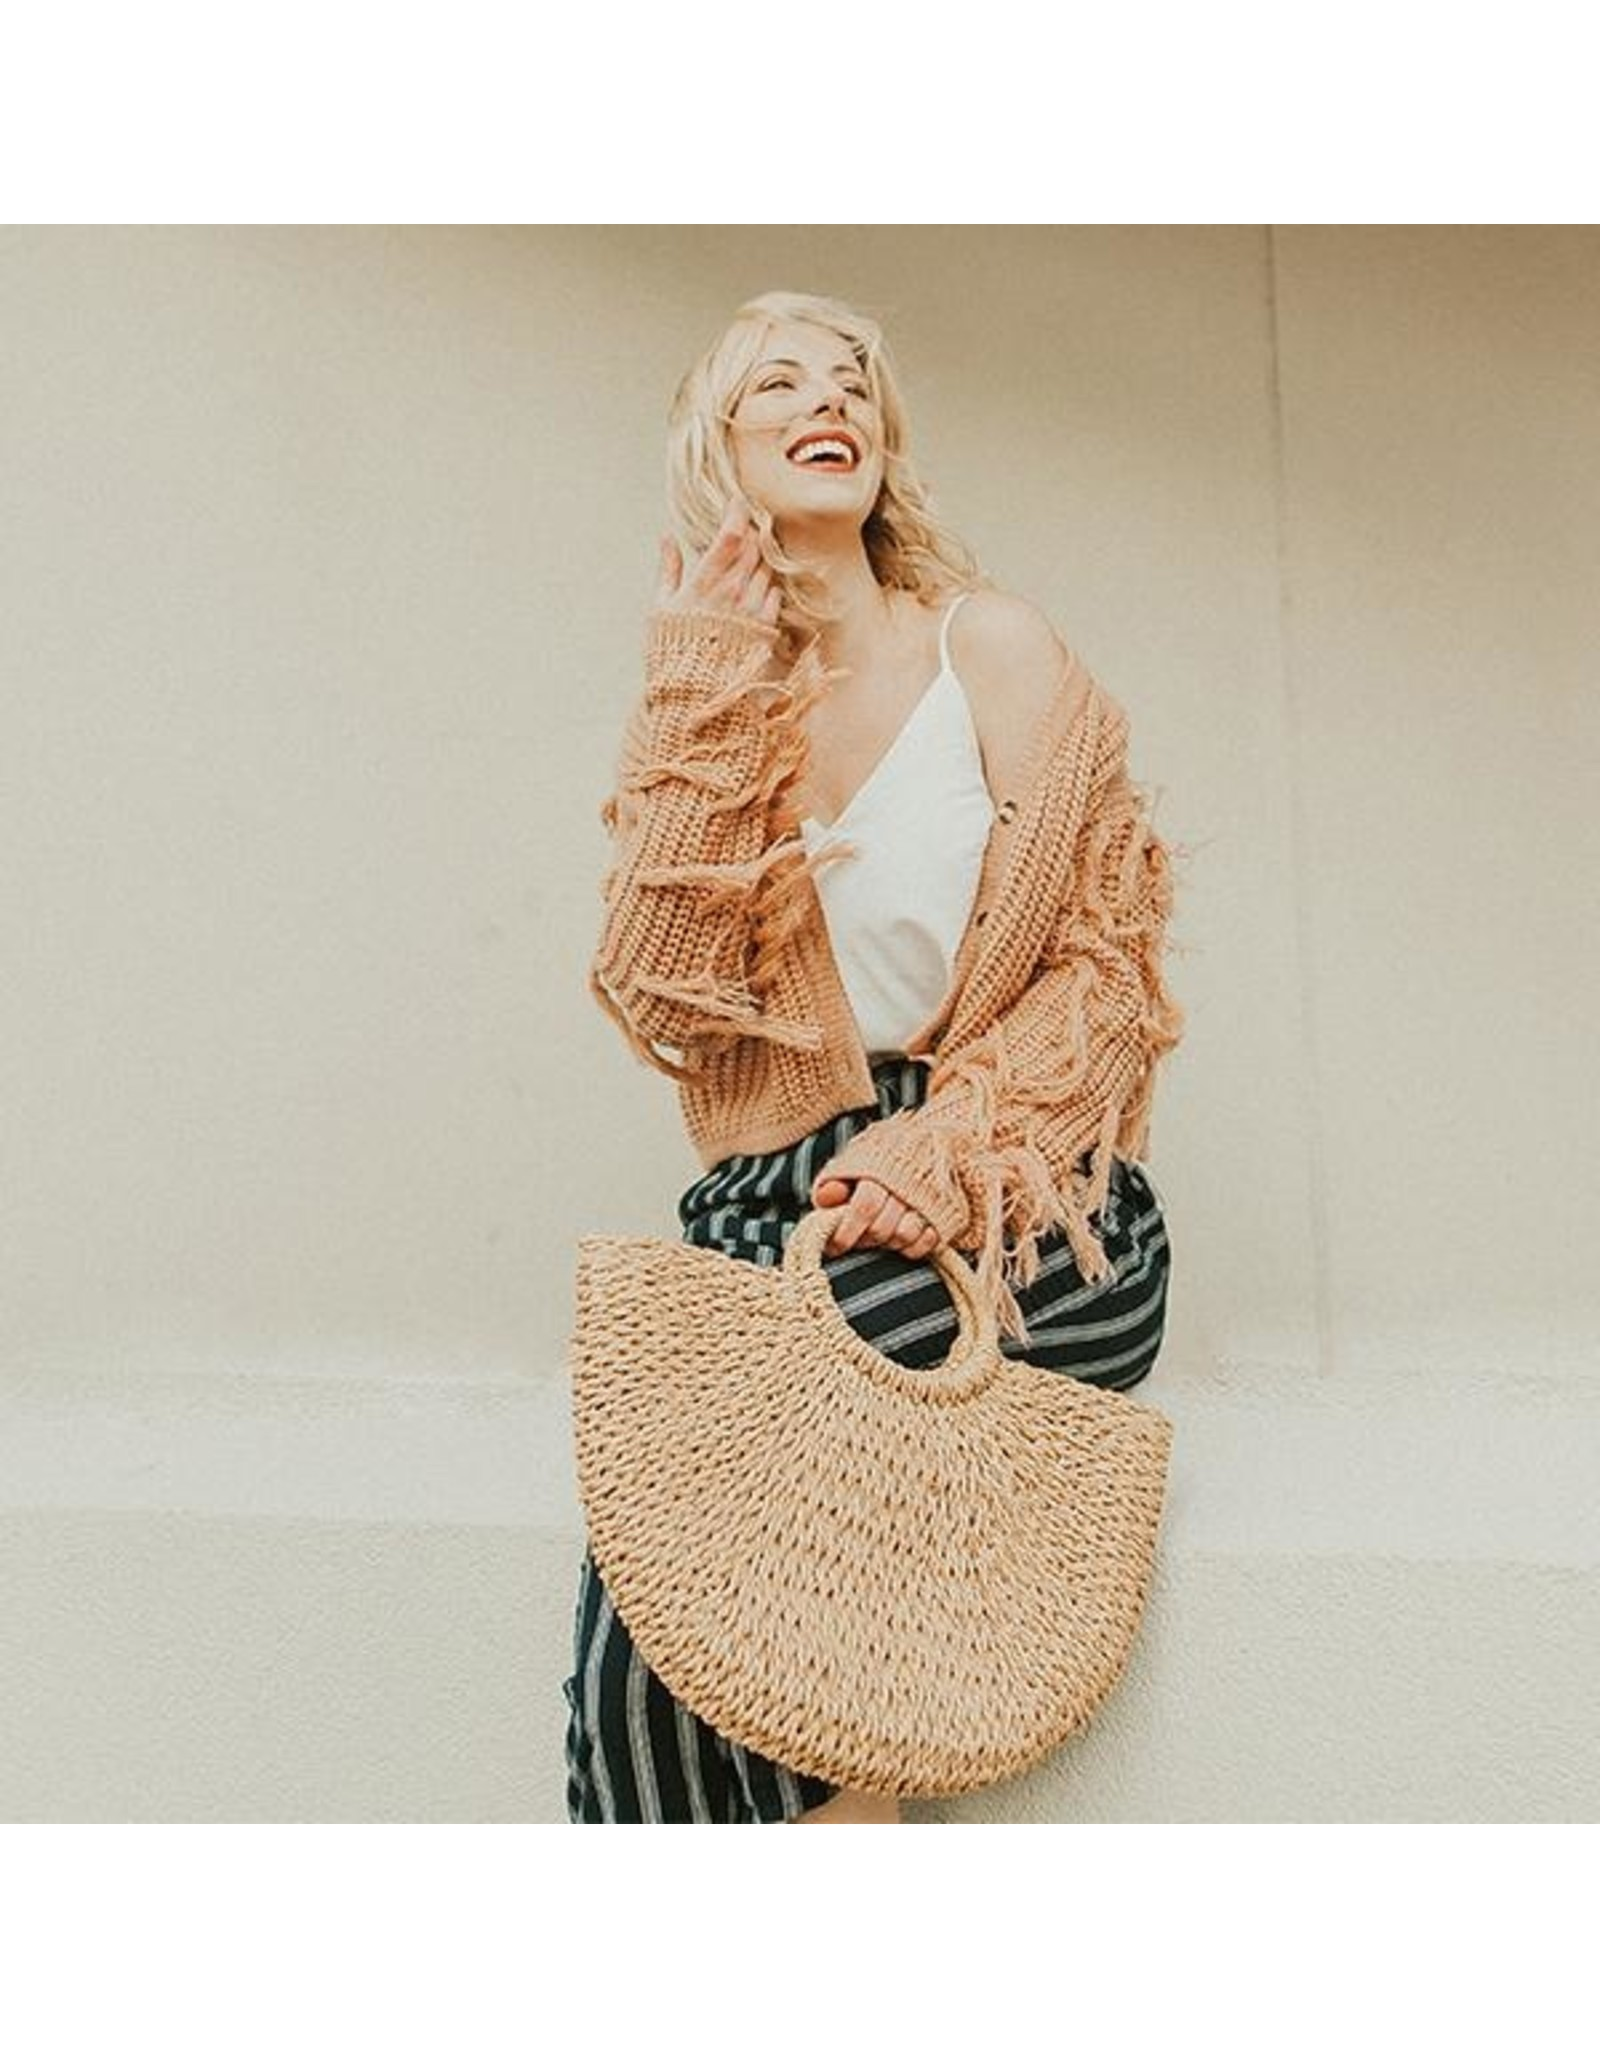 K.Carroll Straw Bag 6711 (S1)